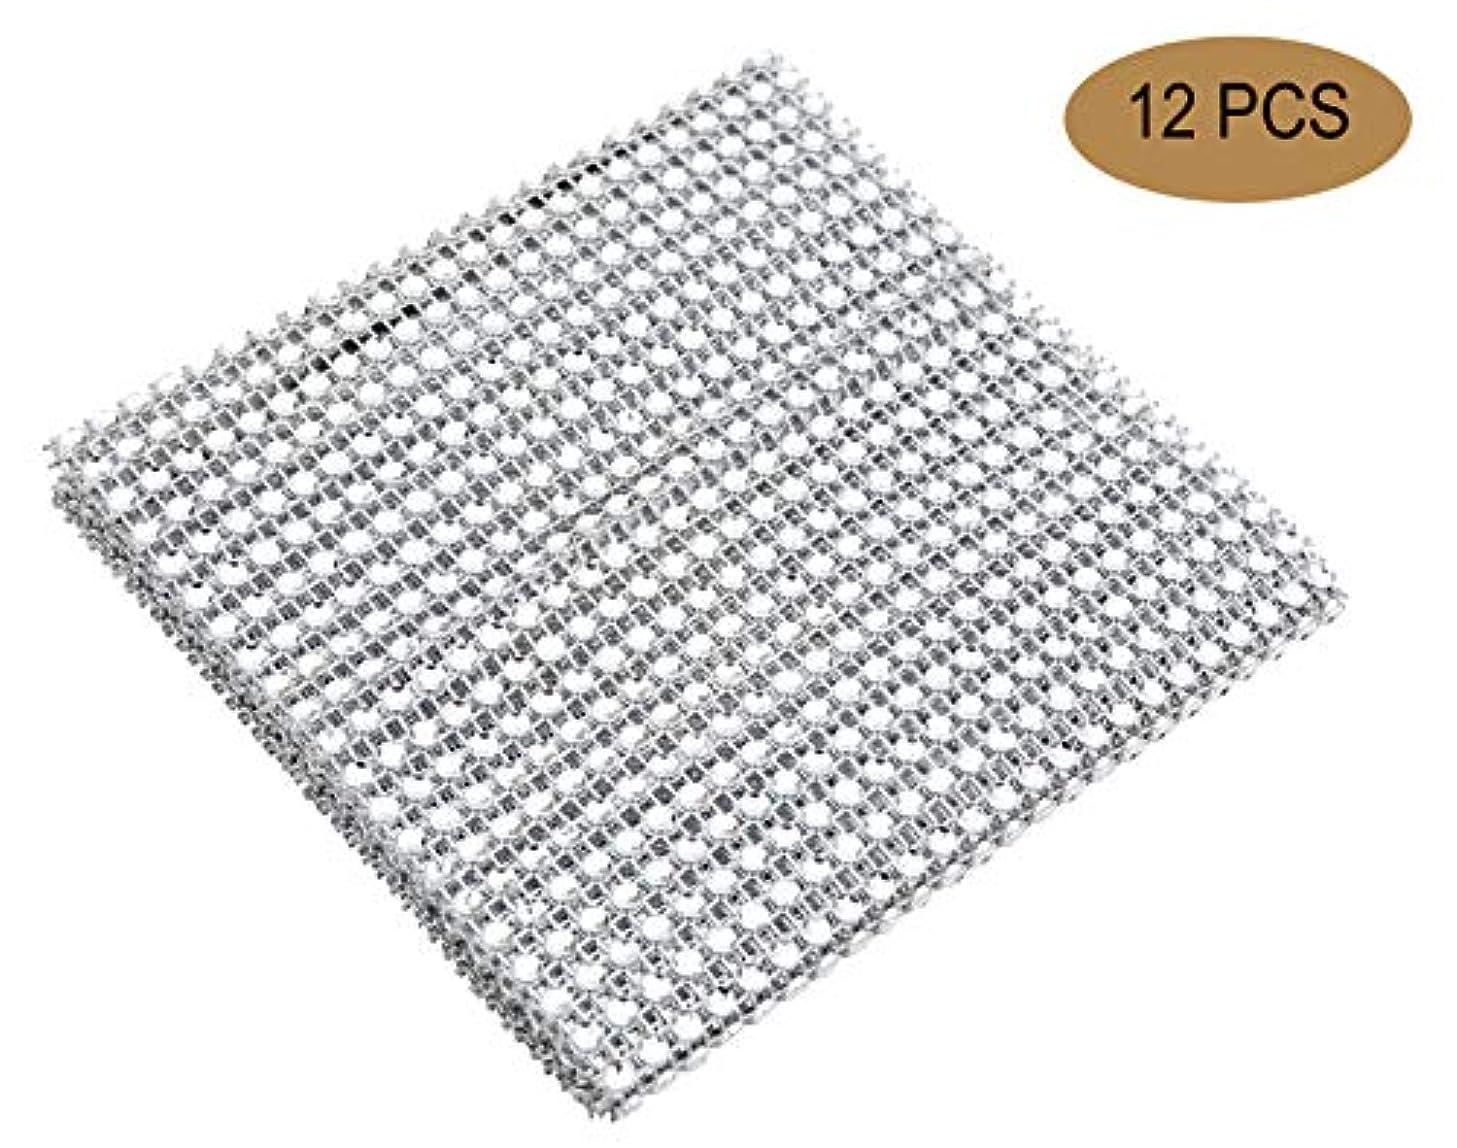 YYaaloa 12pcs 24 Rows 1 Yard Imitation Diamond Rhinestone Ribbon Mesh for Weeding Banquet Decoration Wrap Craft (Silver 12PCS)